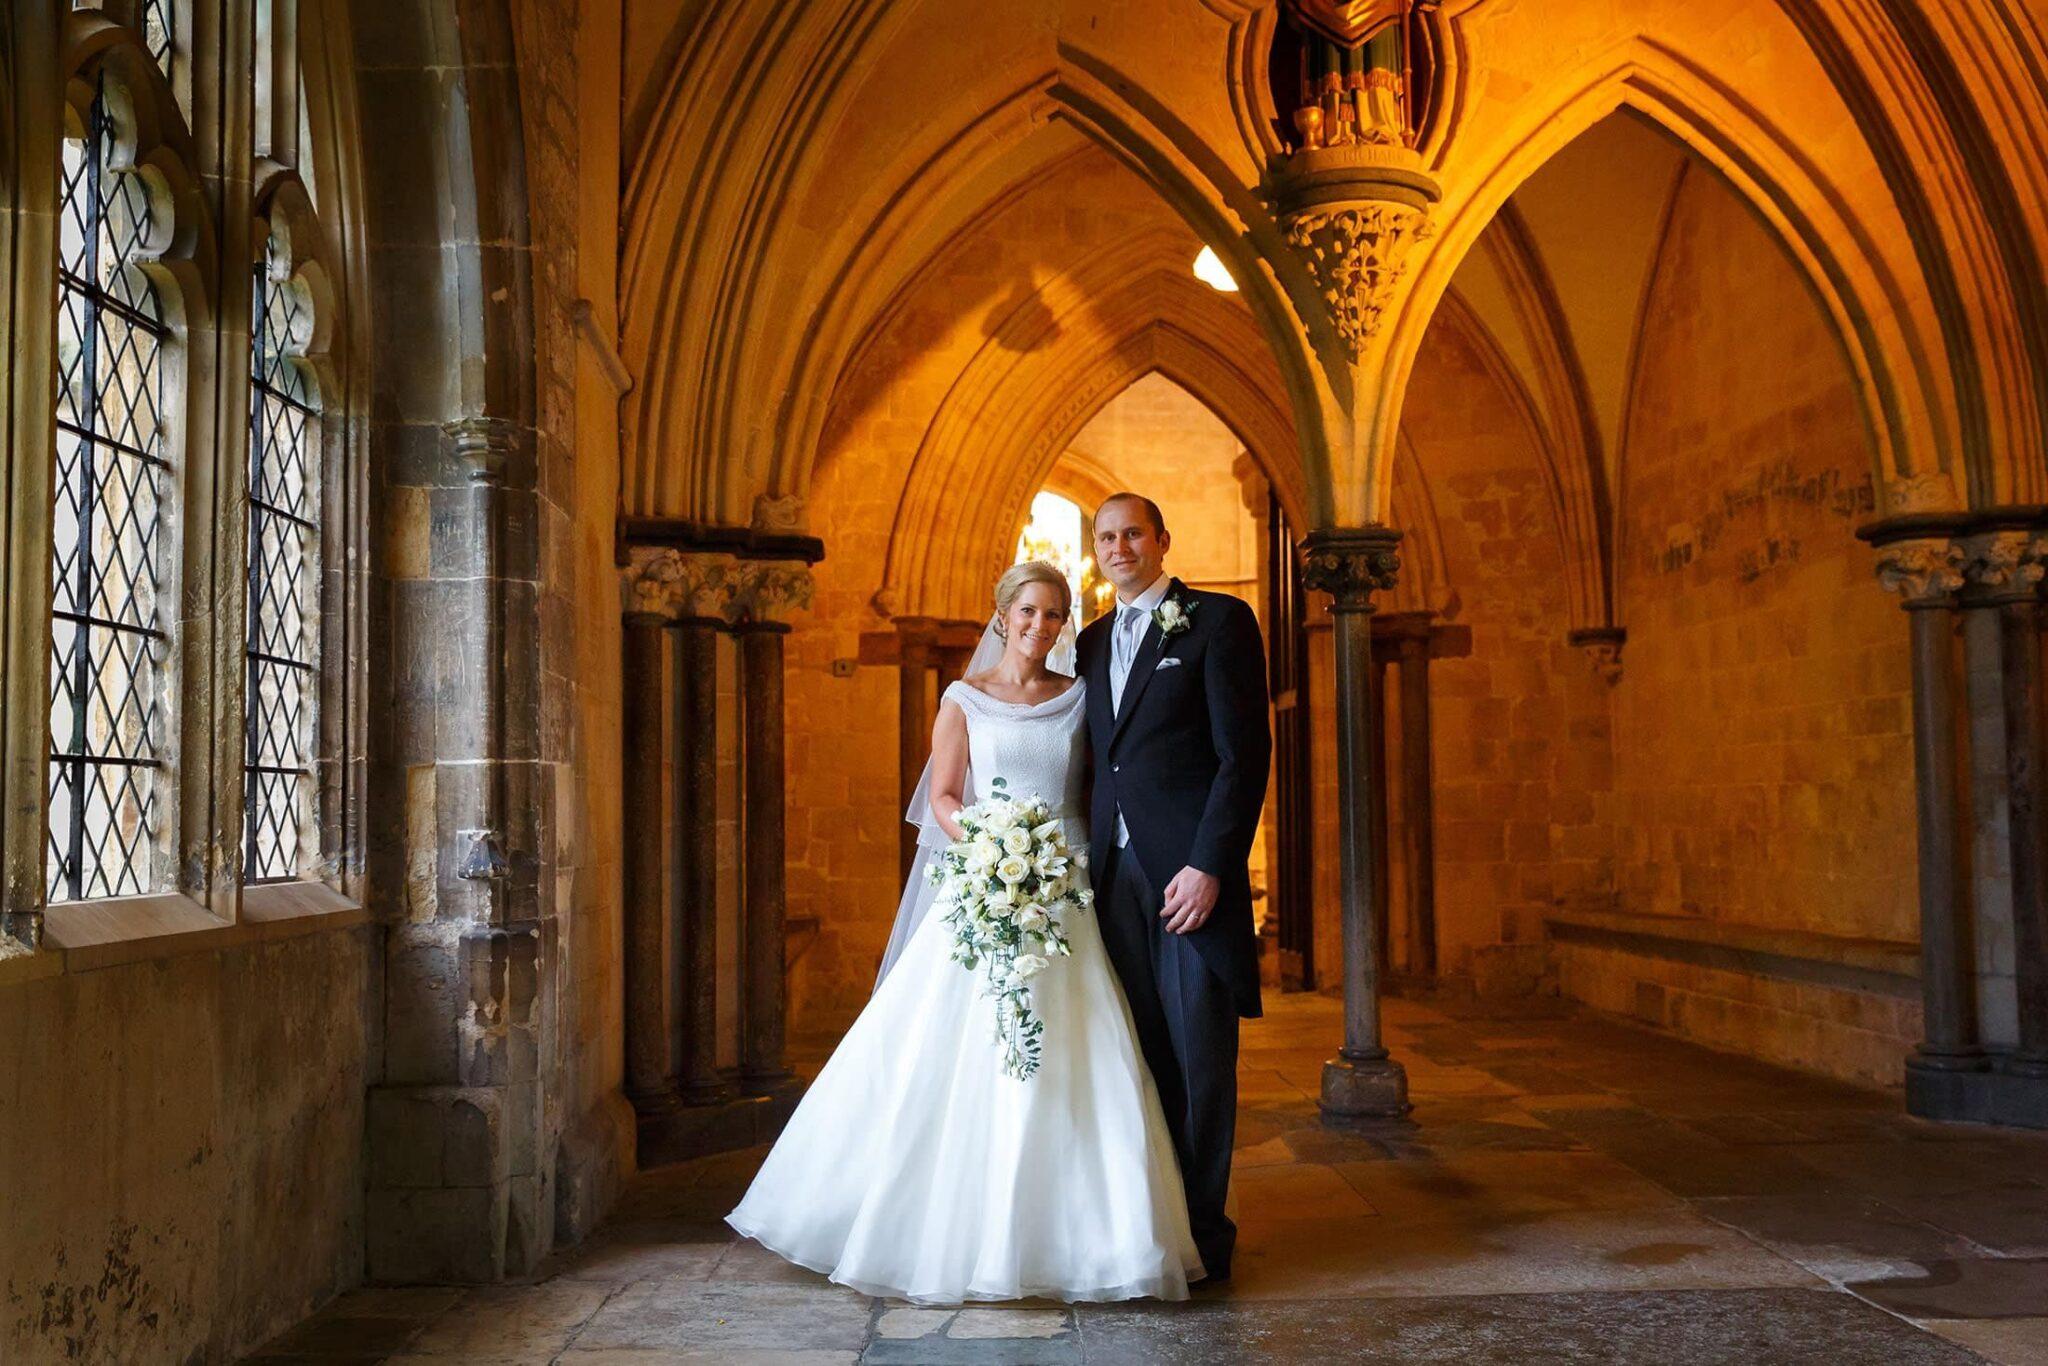 Goodwood wedding photography of Leah & Richard